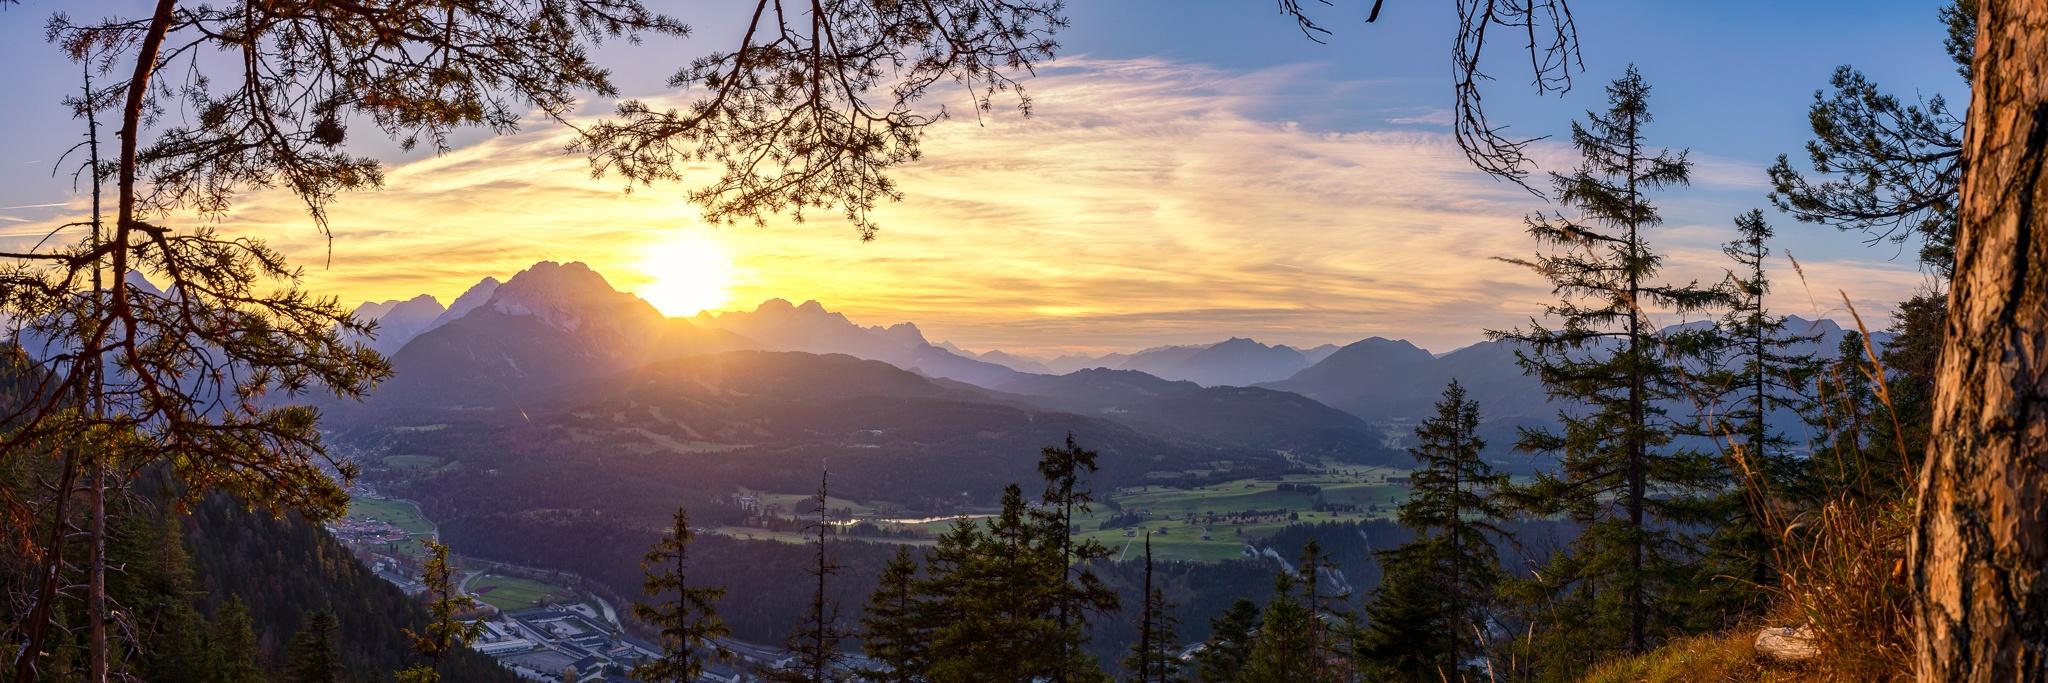 Sonnenuntergang, Berglandschaft, Alpen, Karwendelhauptkamm, Mittenwald